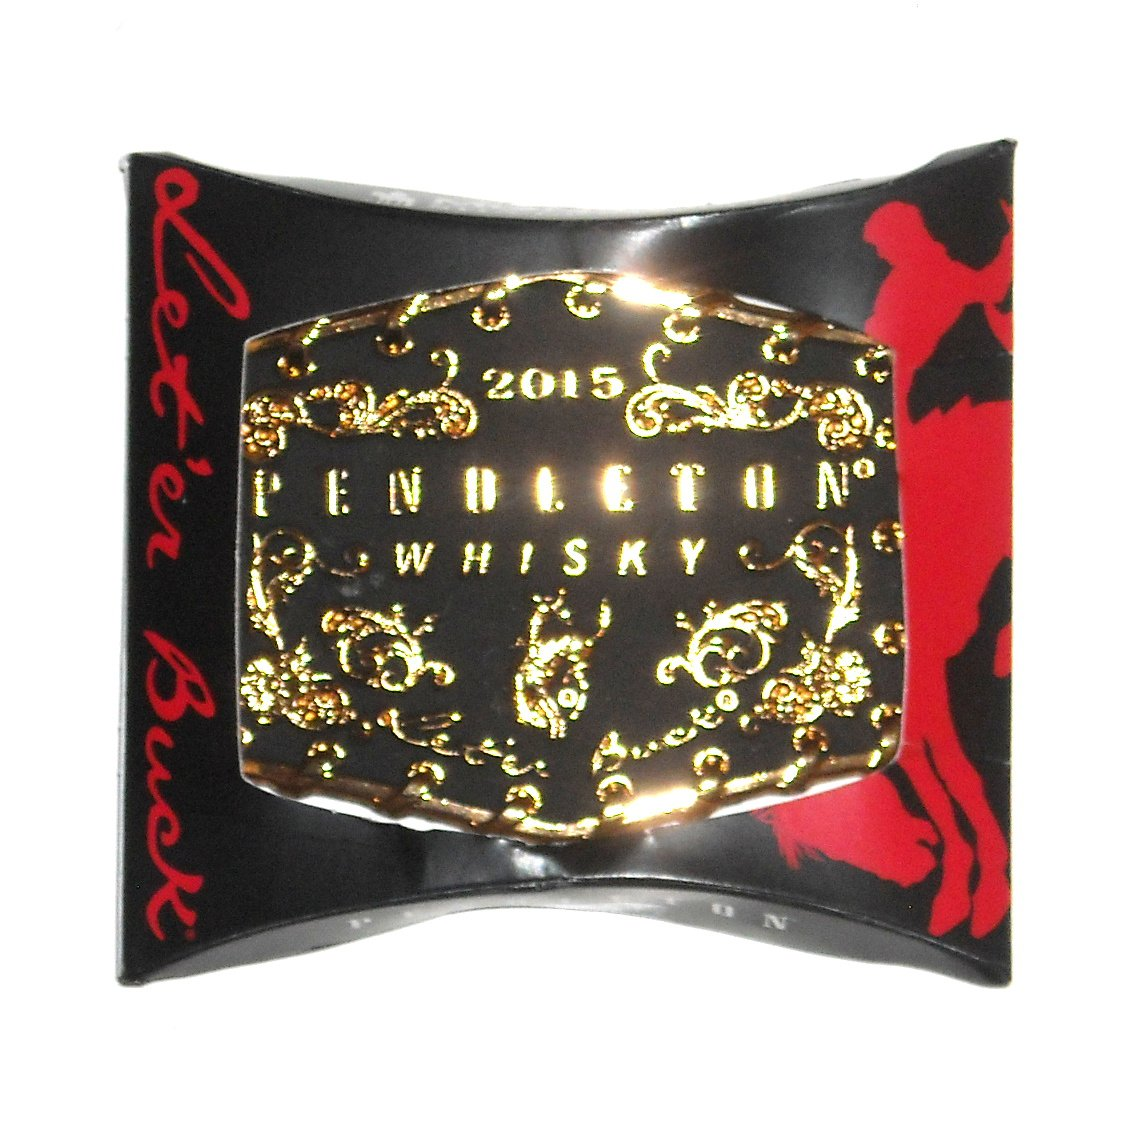 2015 Pendleton Whisky Round Up Rodeo Montana Silversmiths Belt Buckle